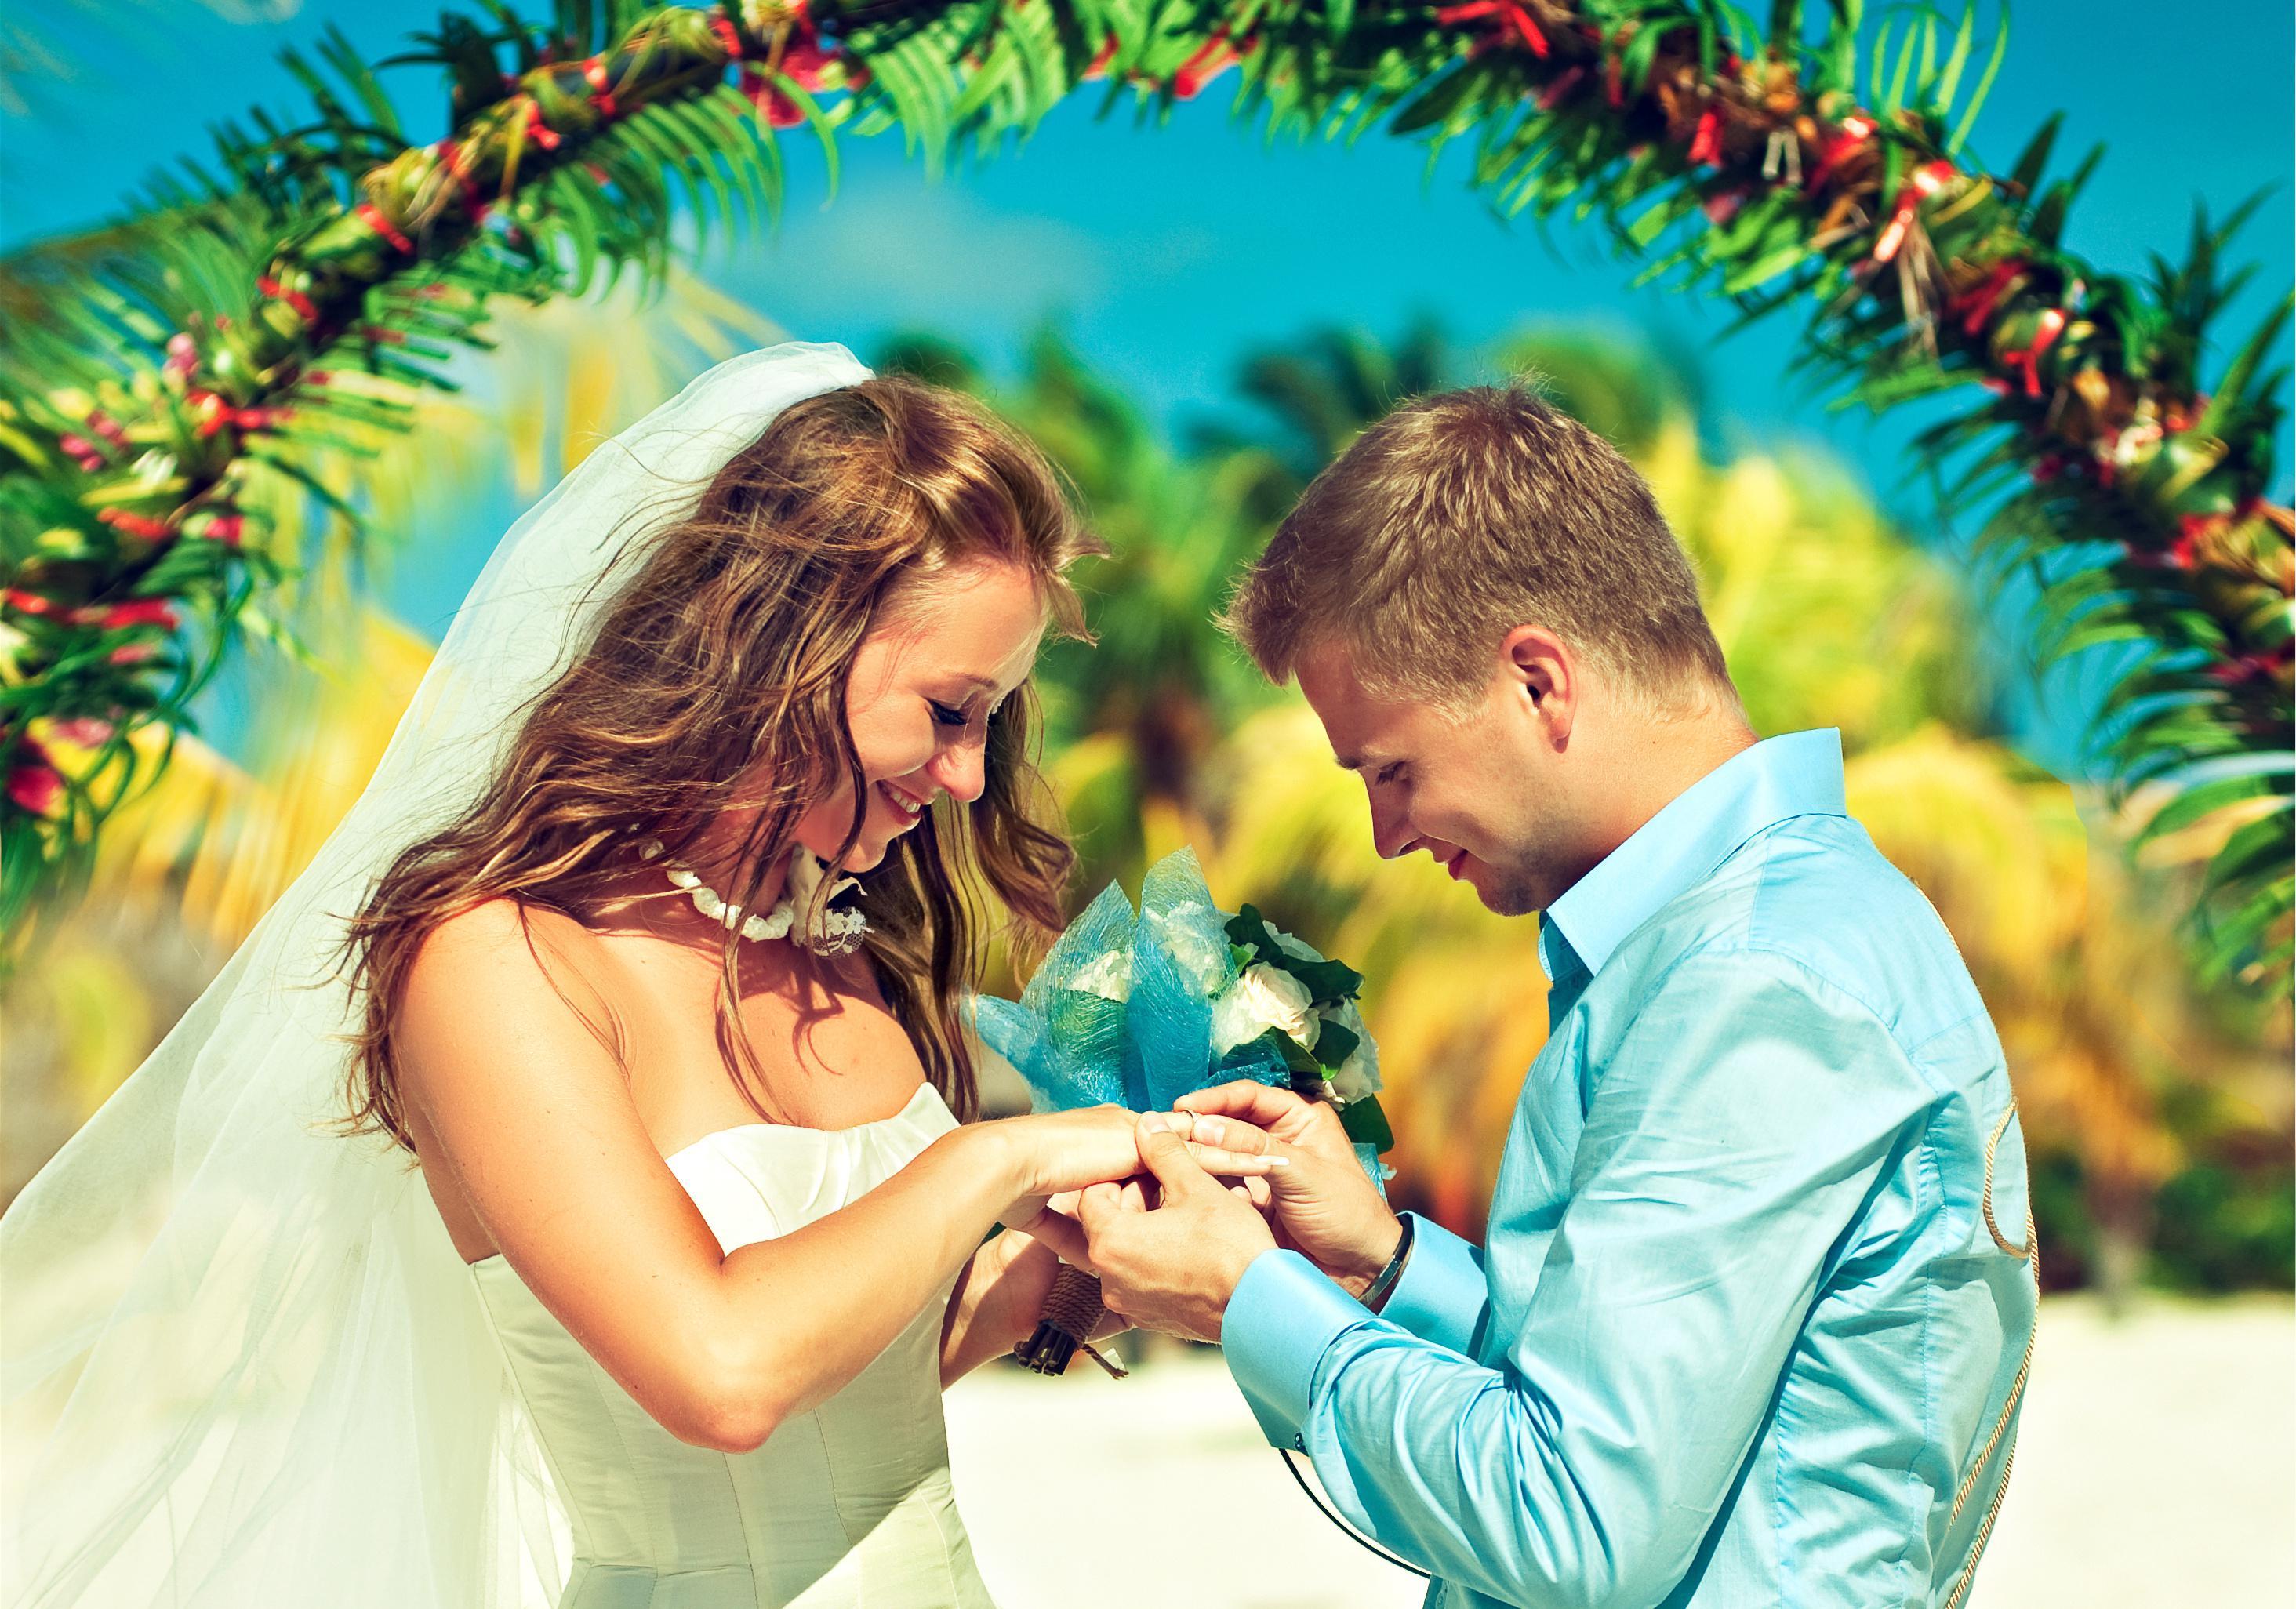 WEDDING DAY WALLPAPER   126679   HD Wallpapers   [wallpapersinhqpw 2928x2052